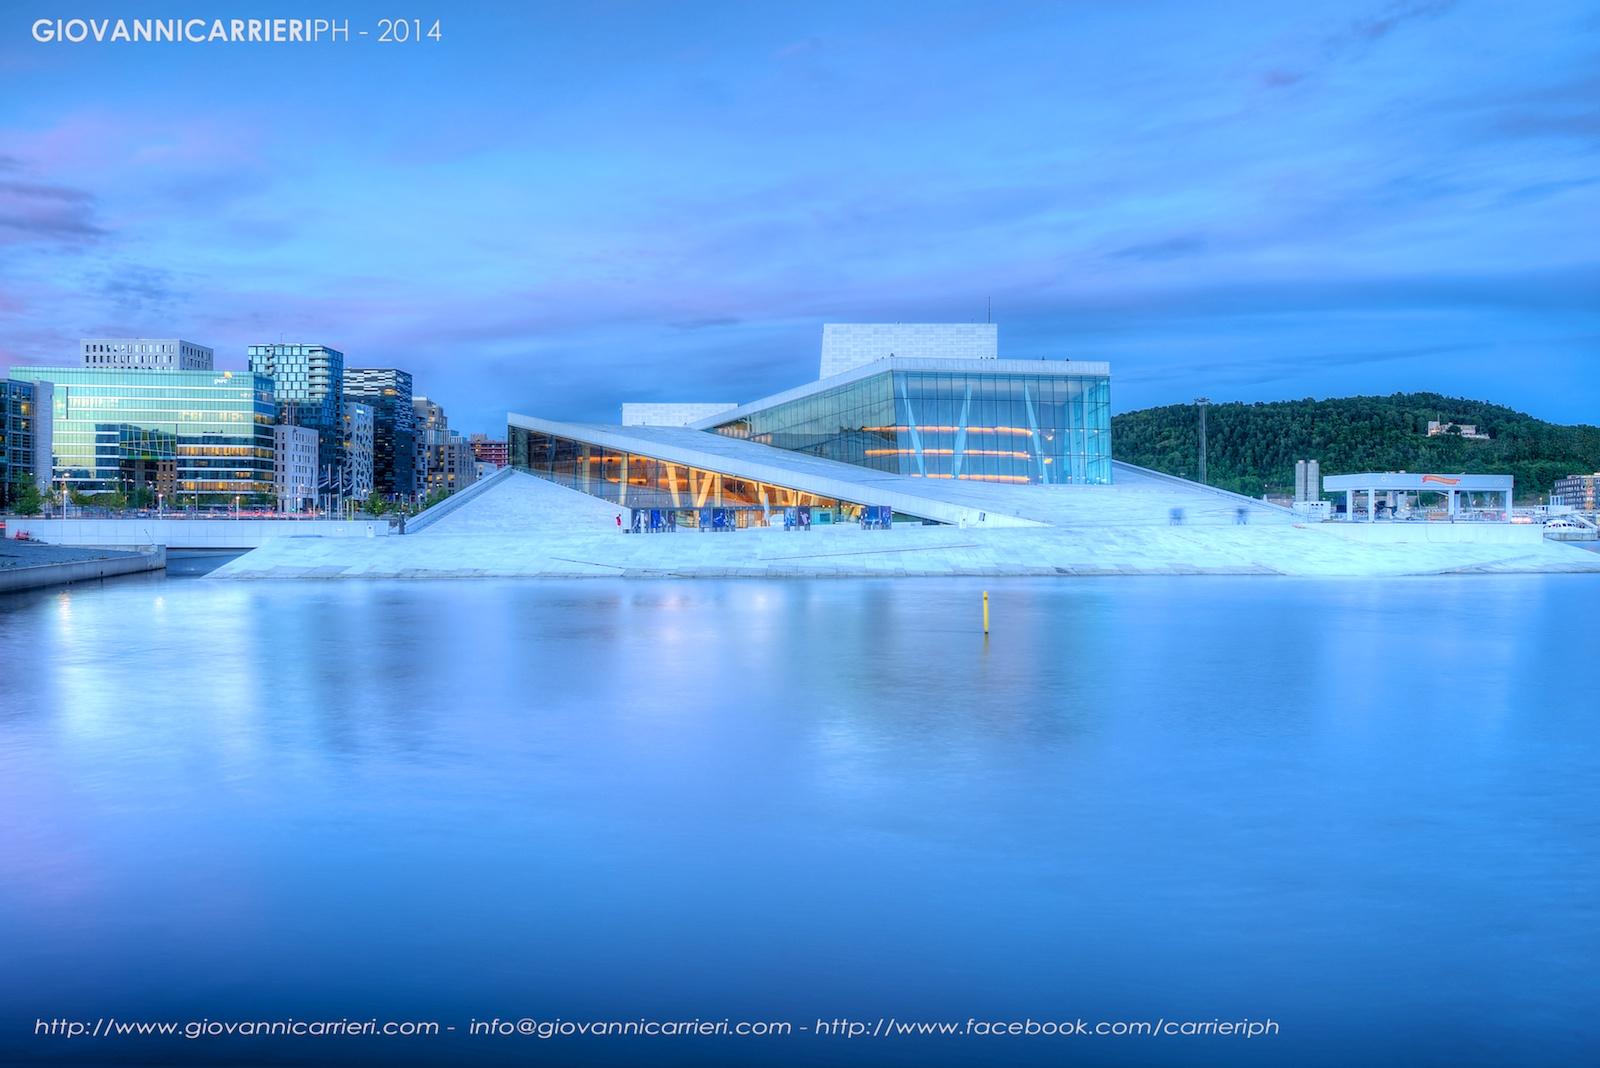 Oslo Opera House vista notturna